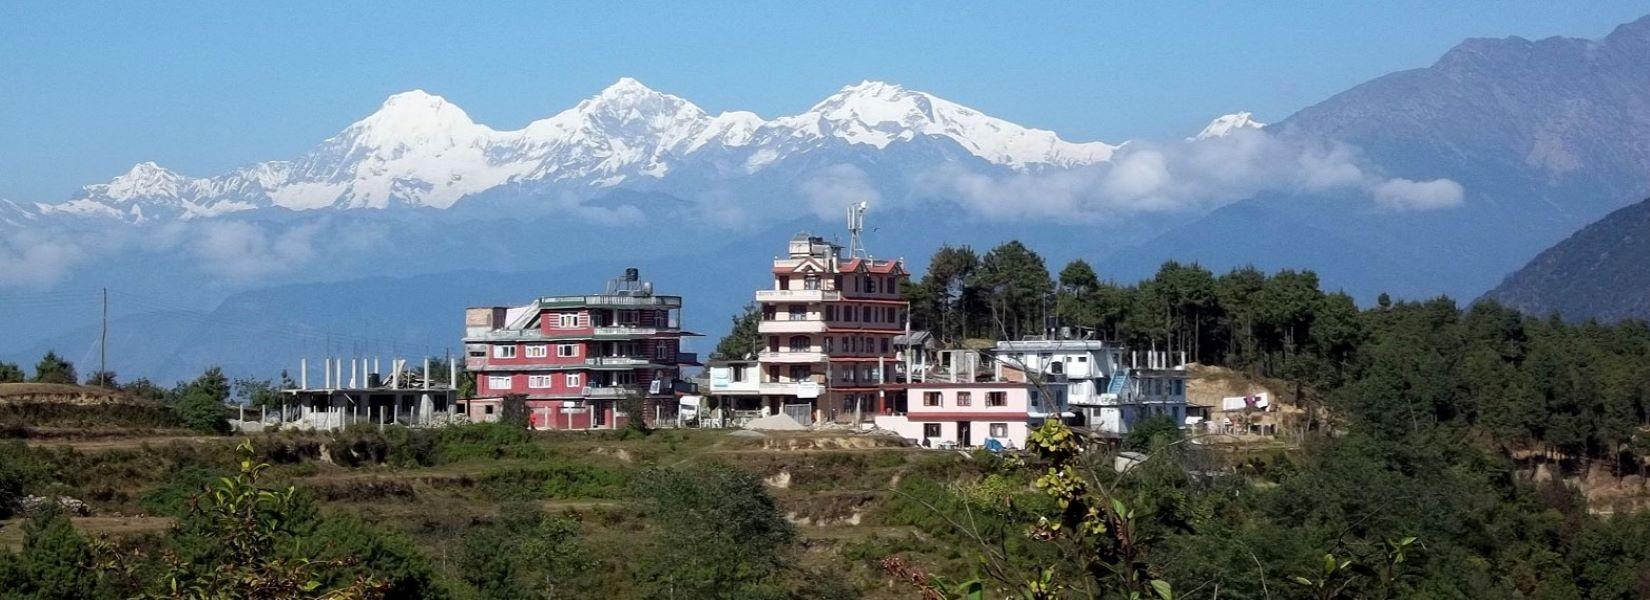 Nagarkot Trekking|Trekking to Nagarkot